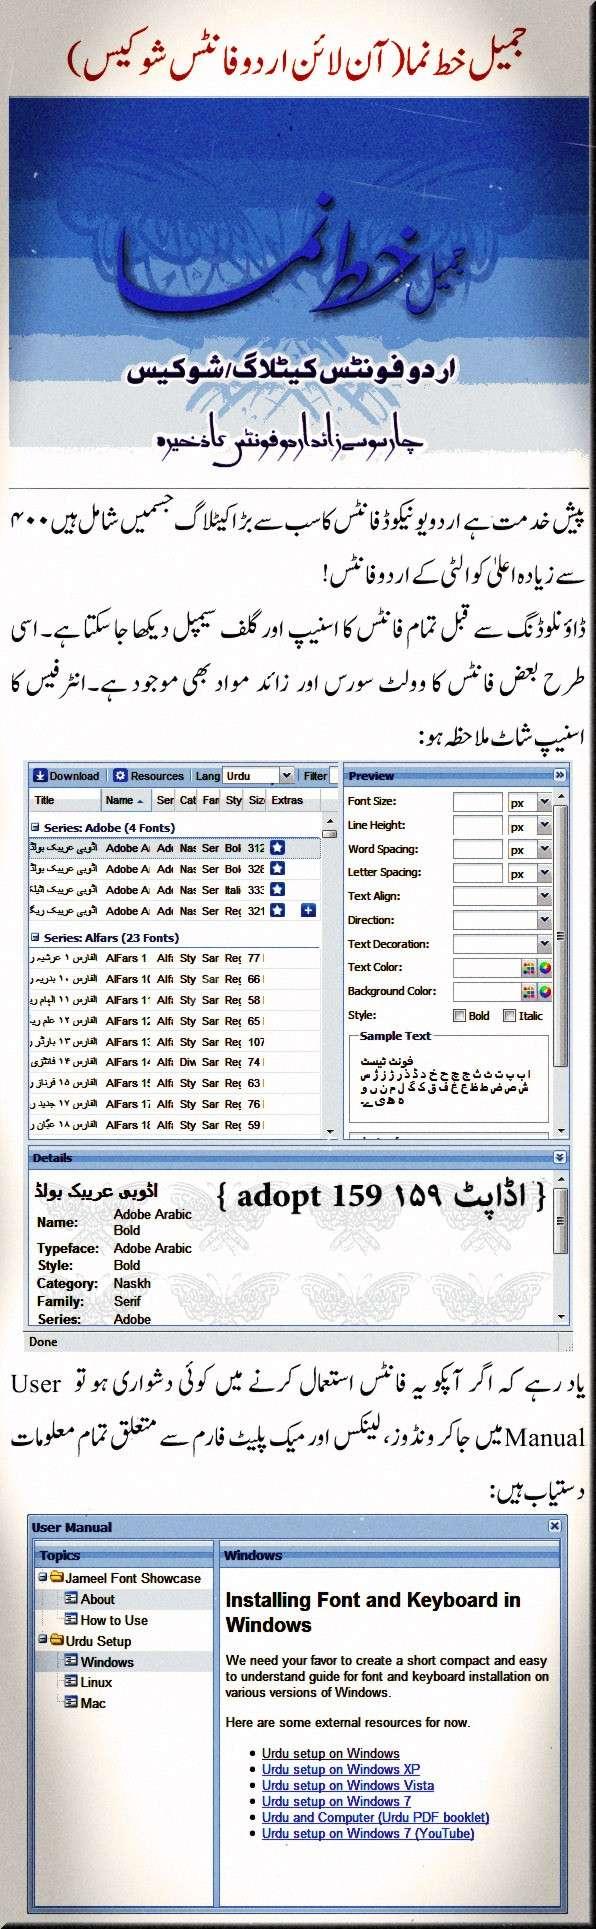 Urdu Fonts Catalogue - Biggest Font Collection Ever!  Jkn210